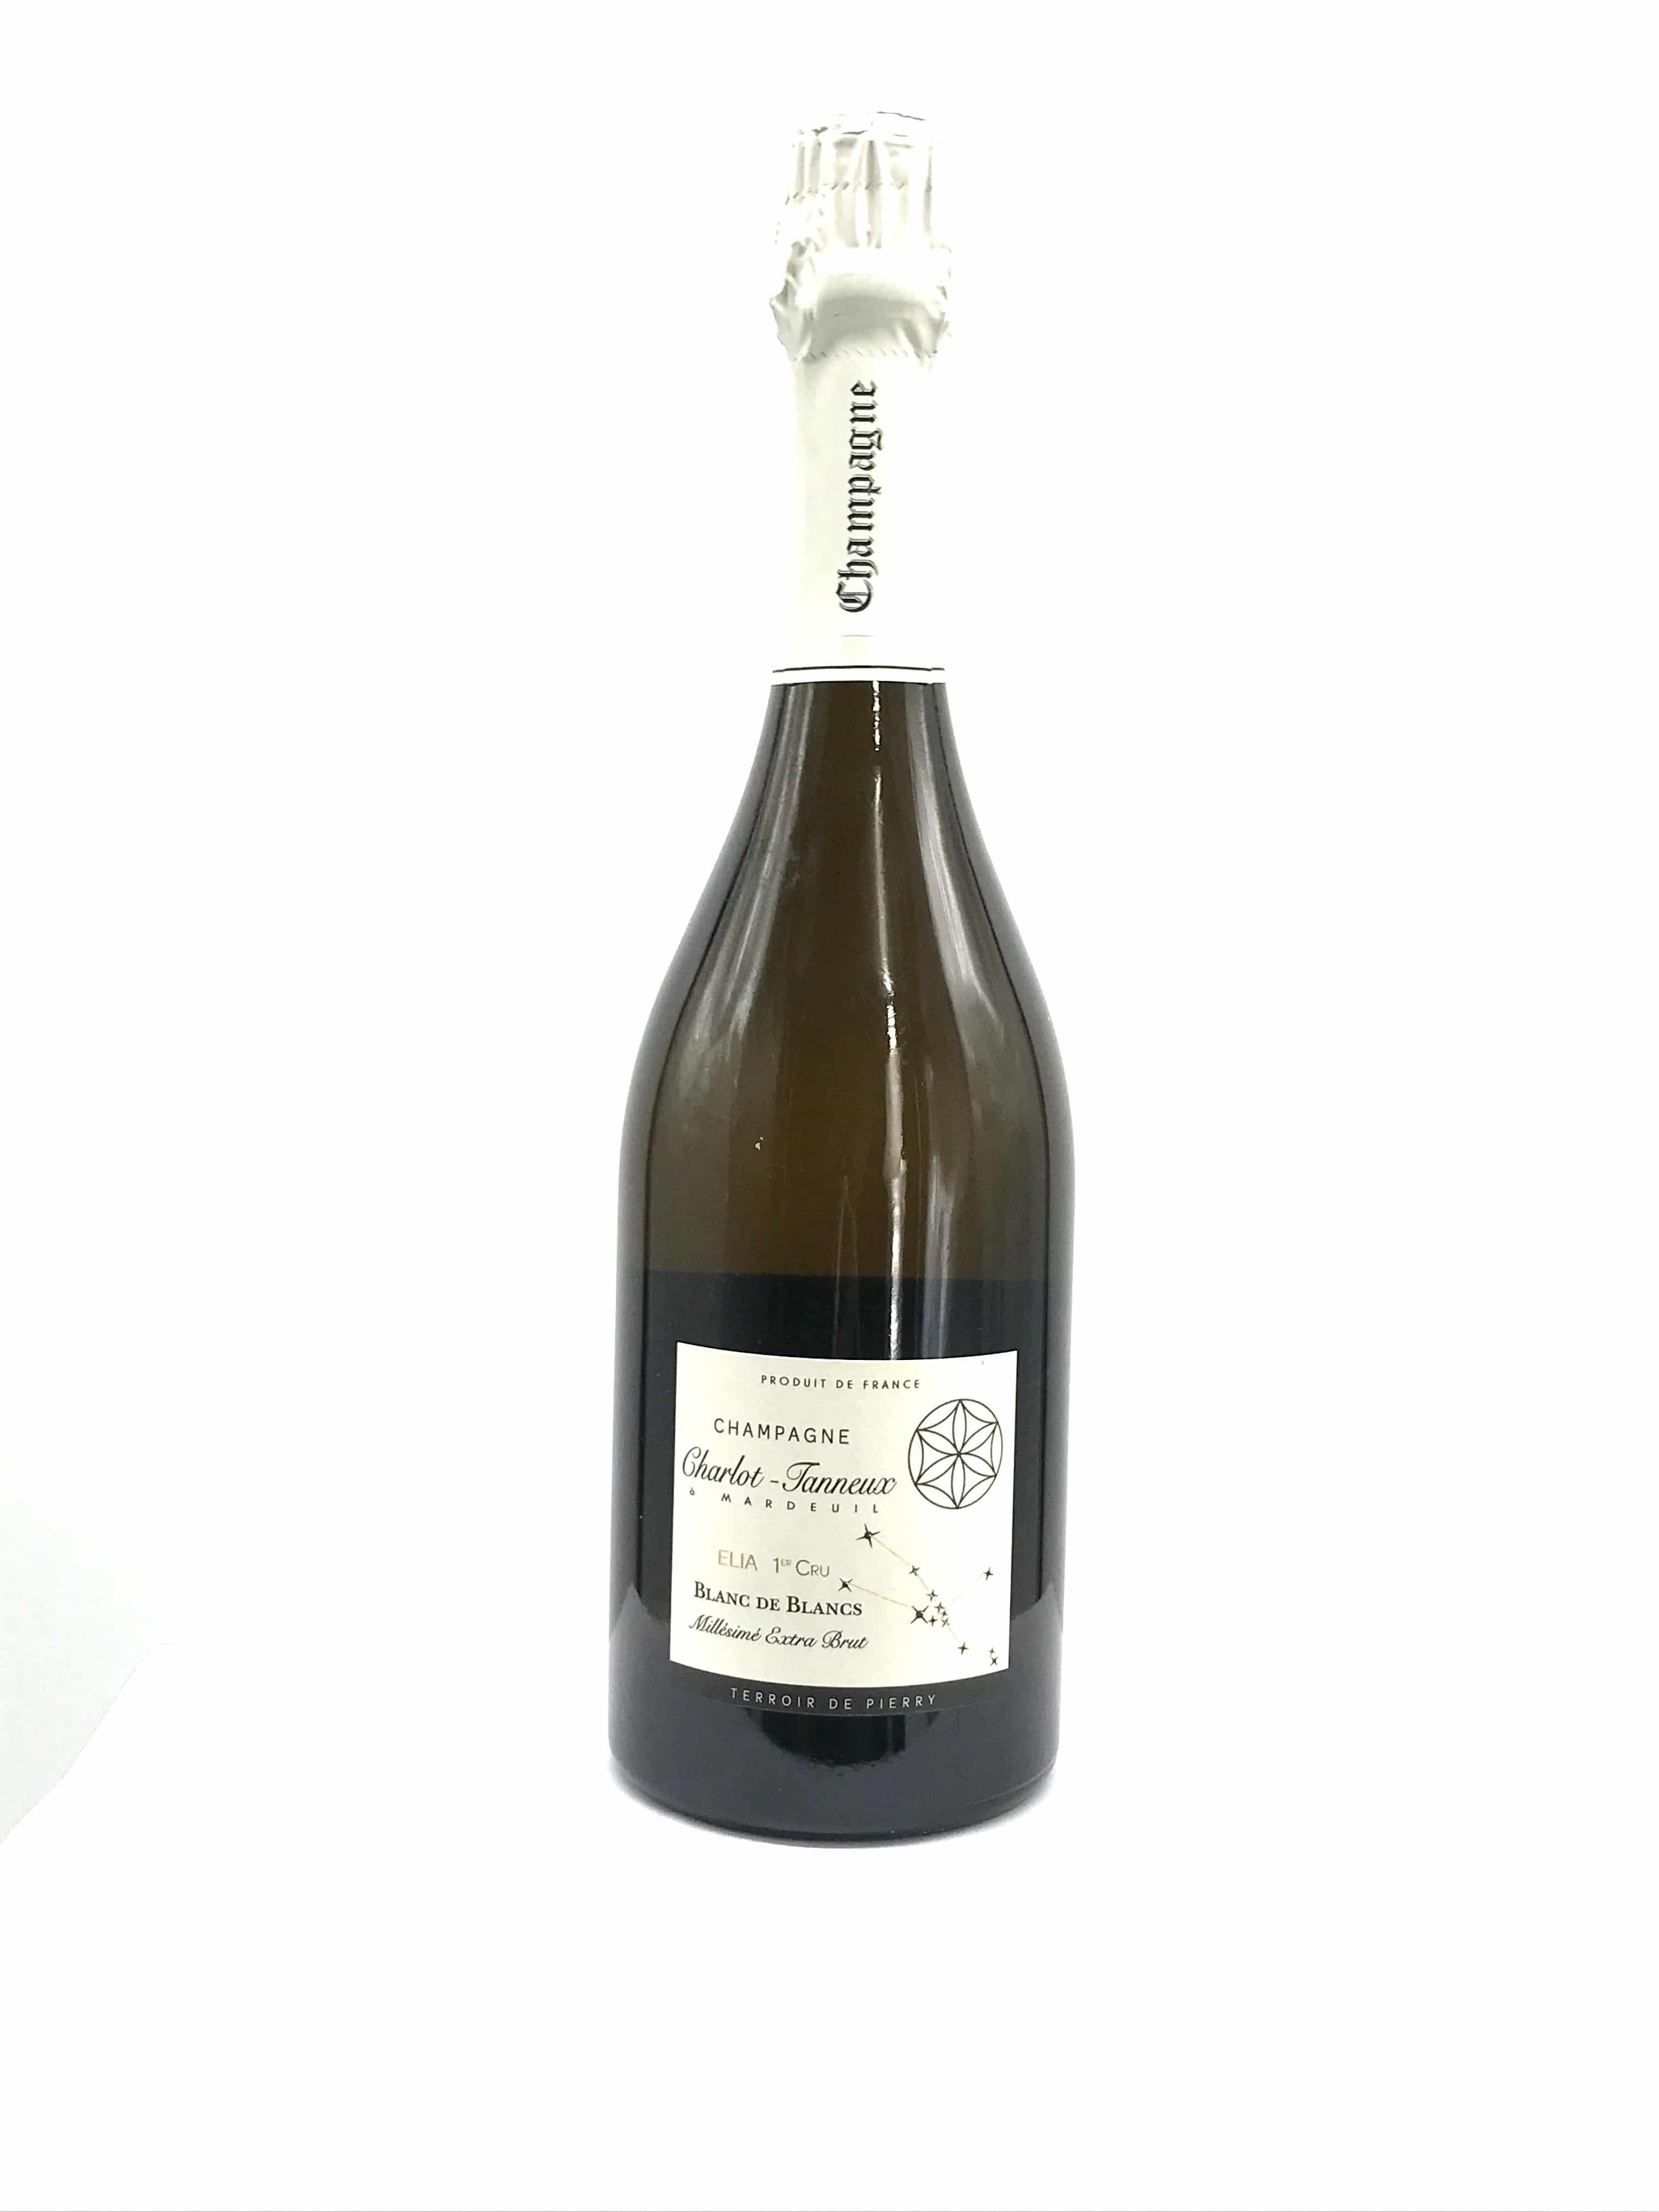 Champagne Charlot Tanneux Cuvee Elia 2012